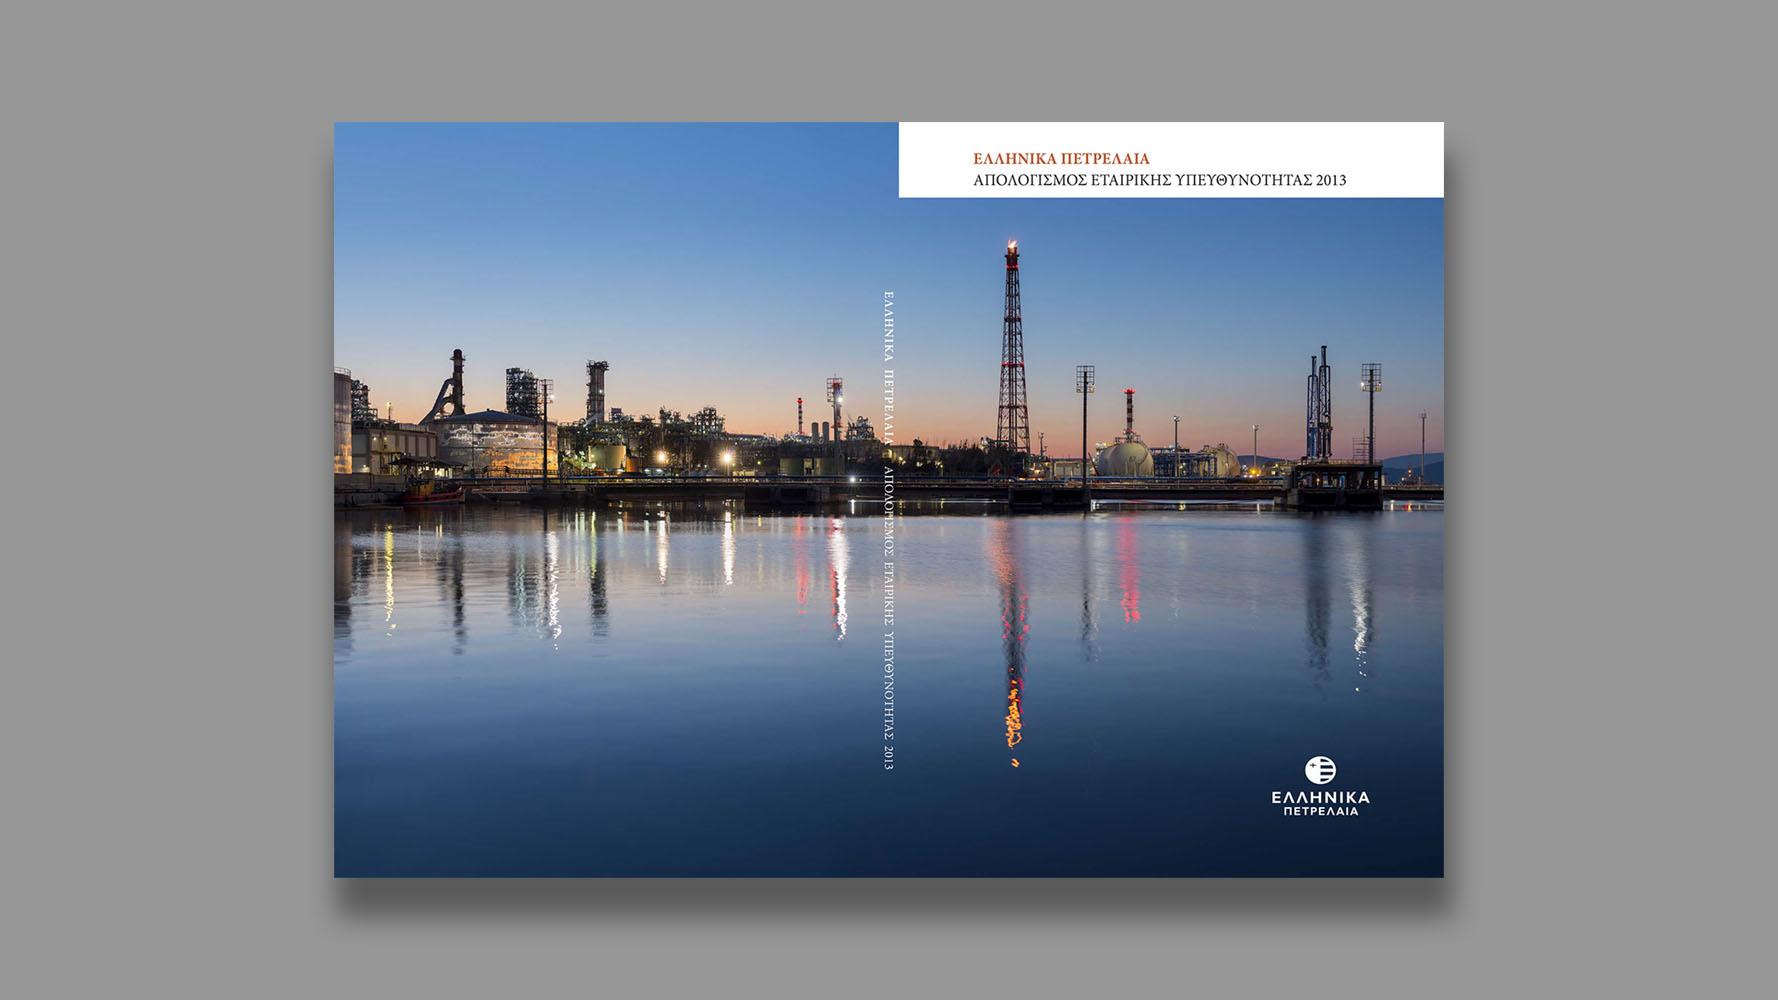 Hellenic Petroleum, Corporate Responsibility Report, 2013